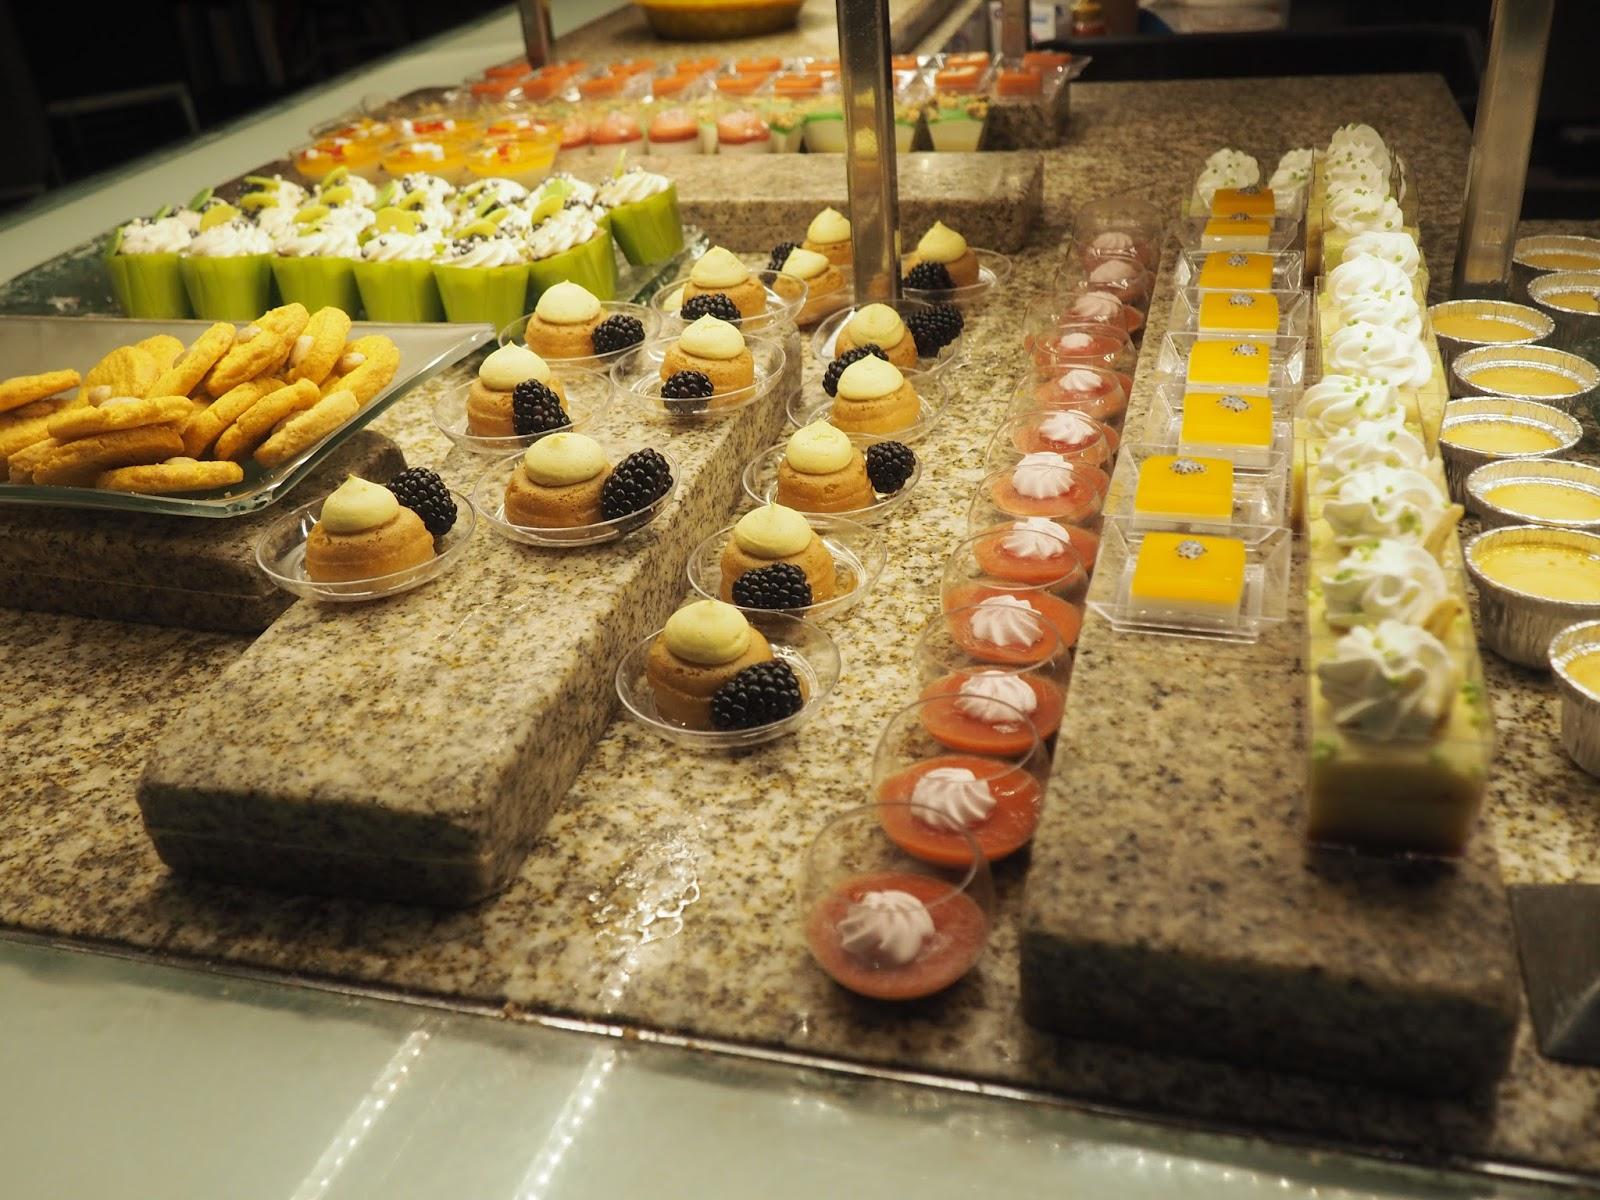 Desserts at Baachanal Buffet at Caesar's Palace, Las Vegas